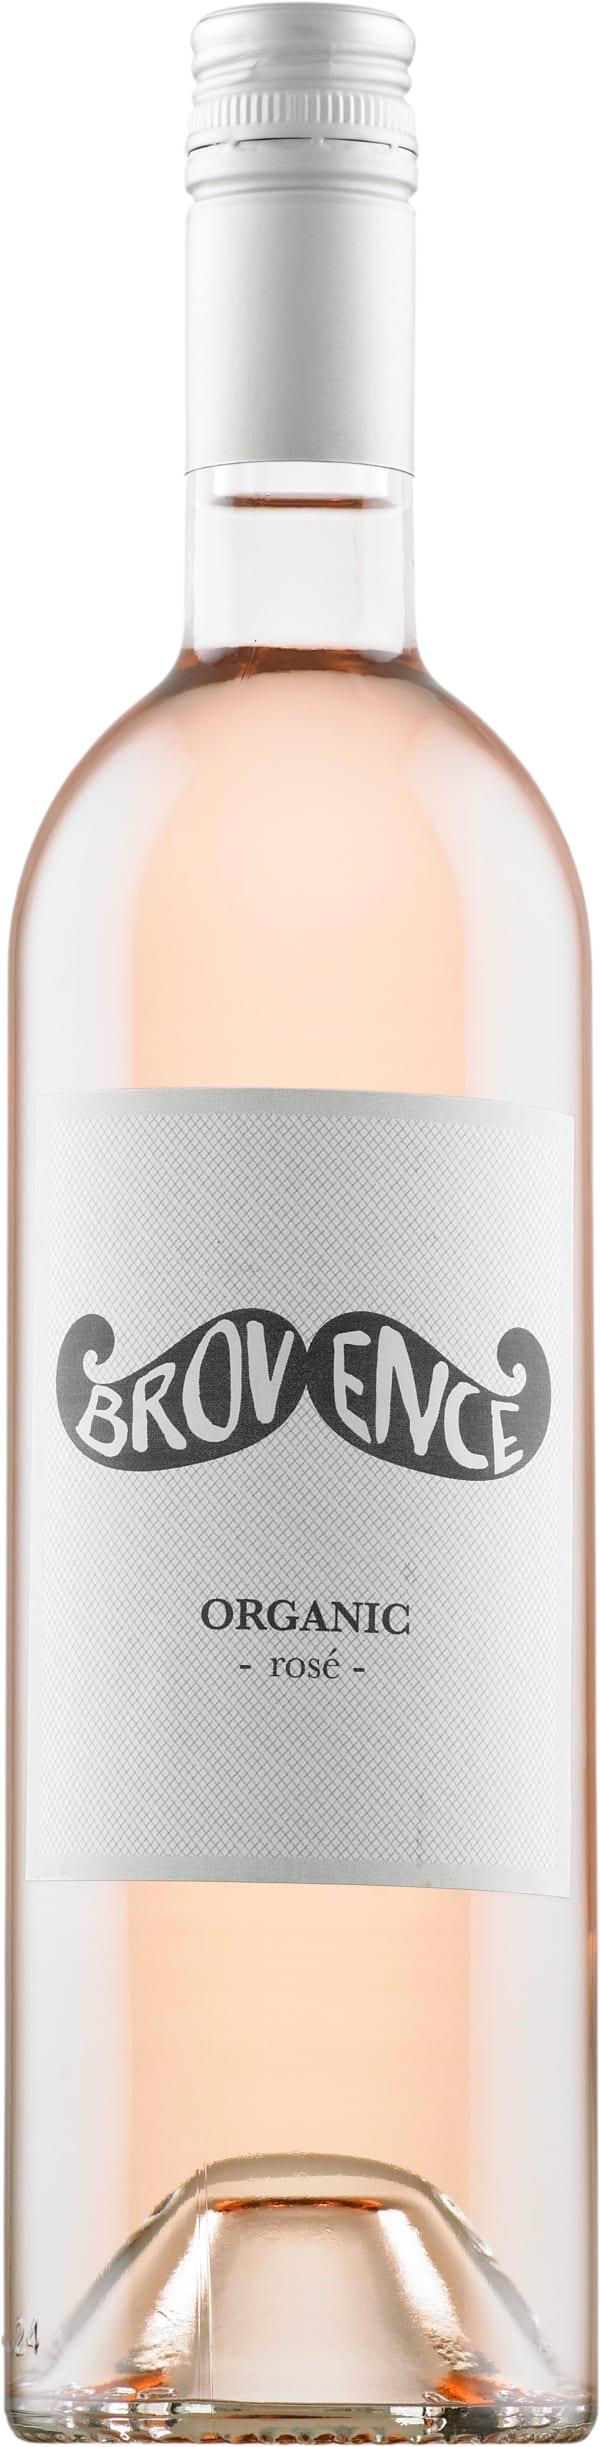 Brovence Organic Rosé 2018